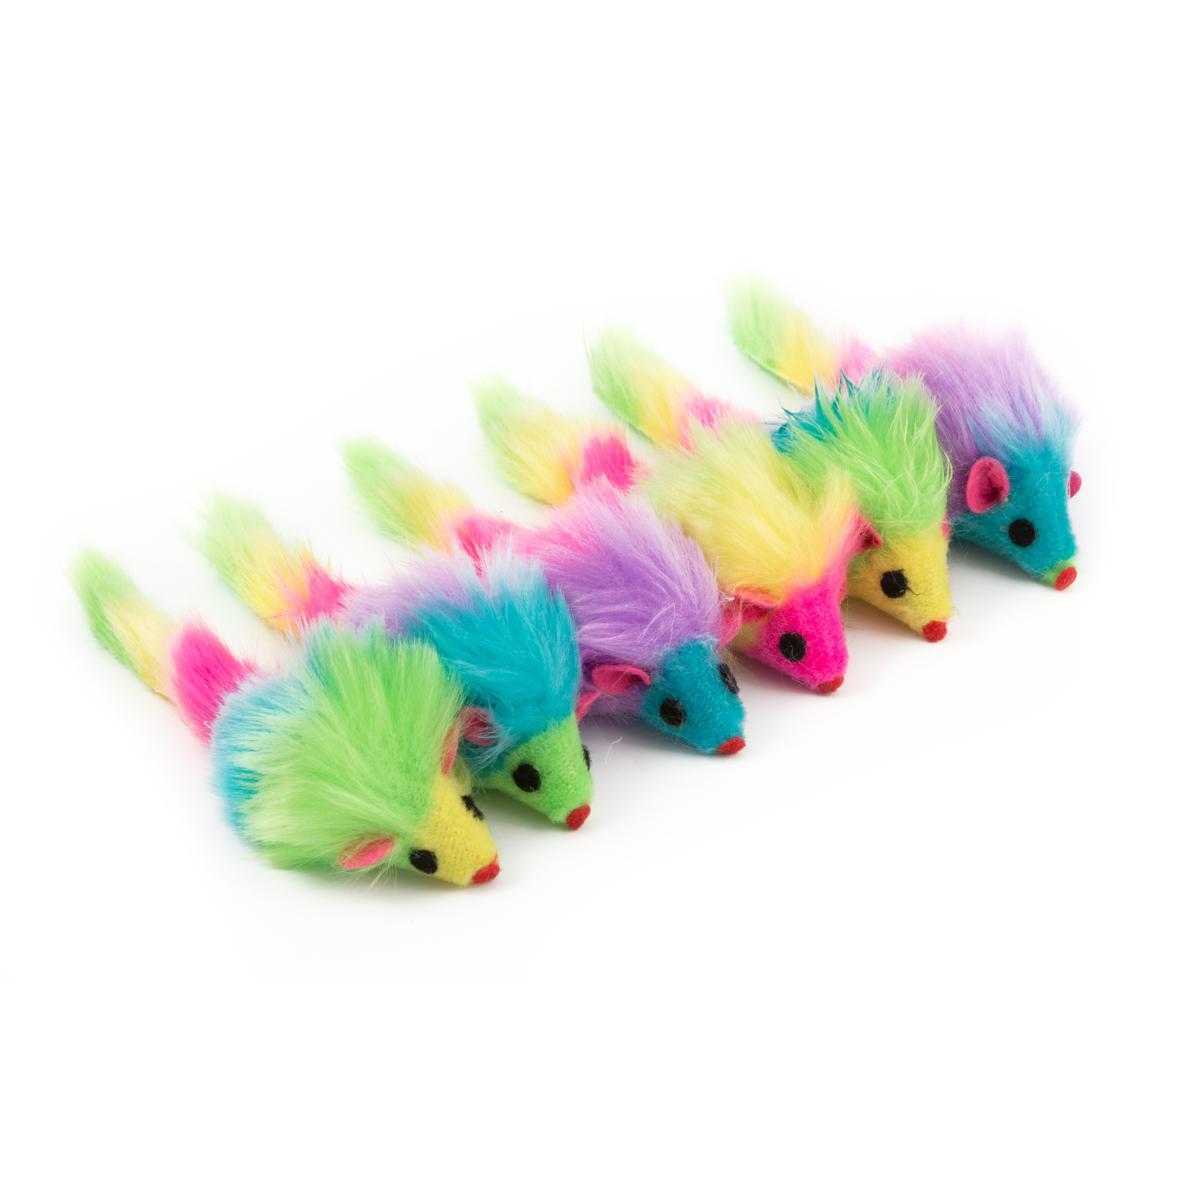 CLEARANCE ANCOL Furry Rainbow Mice 6pcs